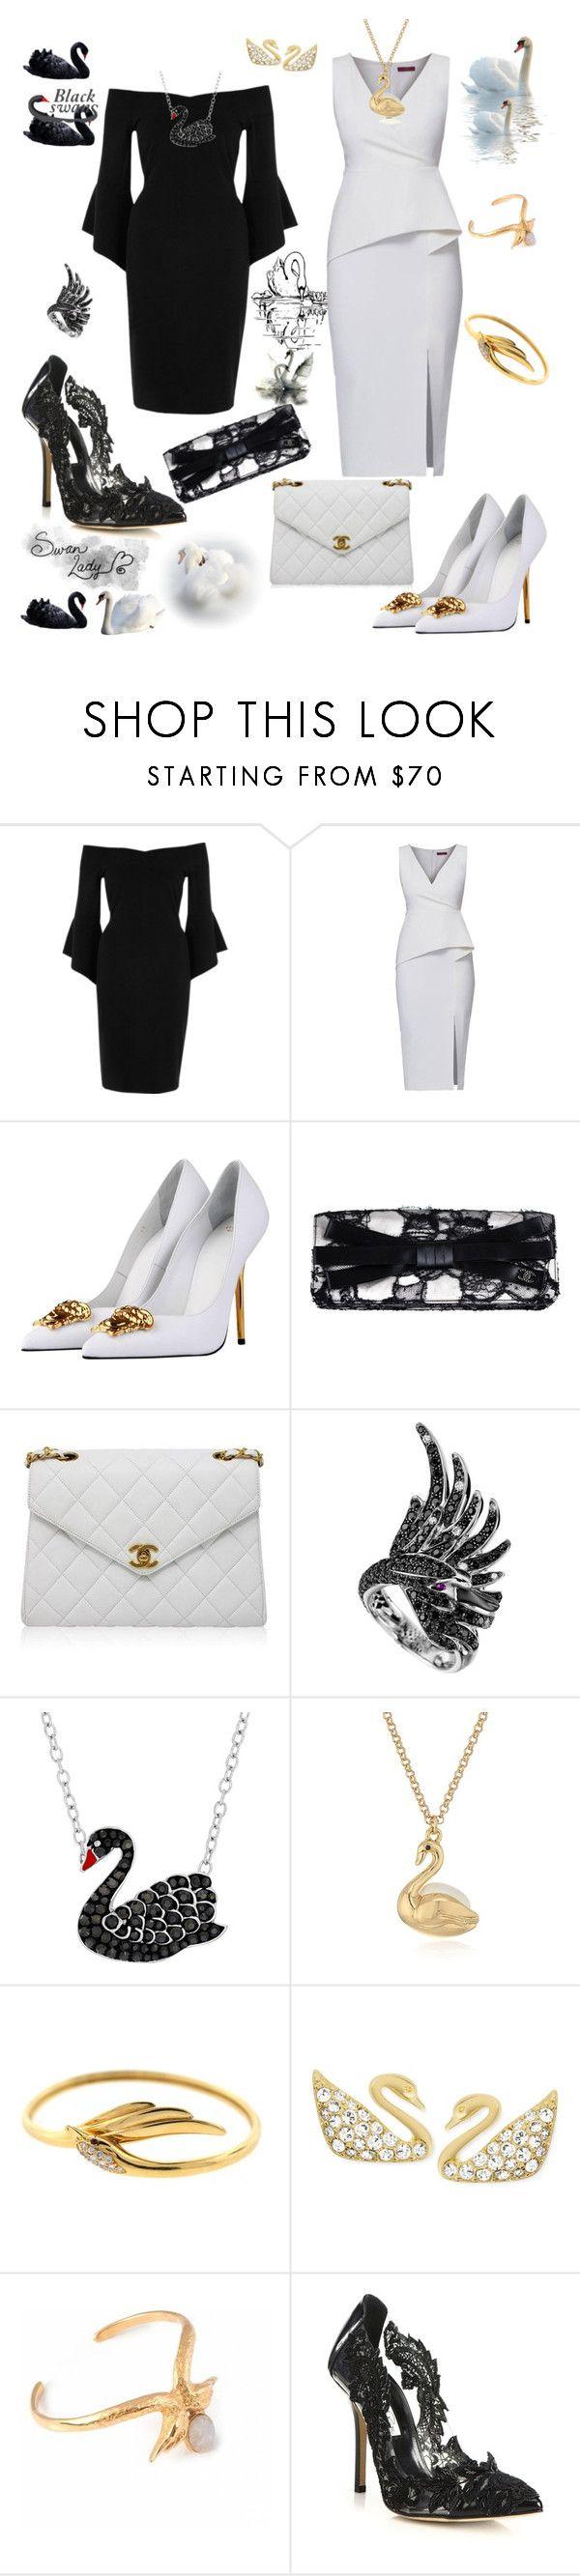 """Black swan and White swan affair"" by agnesmakoni ❤ liked on Polyvore featuring River Island, WtR, Versace, Chanel, Boucheron, Animal Planet, Kate Spade, Swarovski, LeiVanKash and Oscar de la Renta"